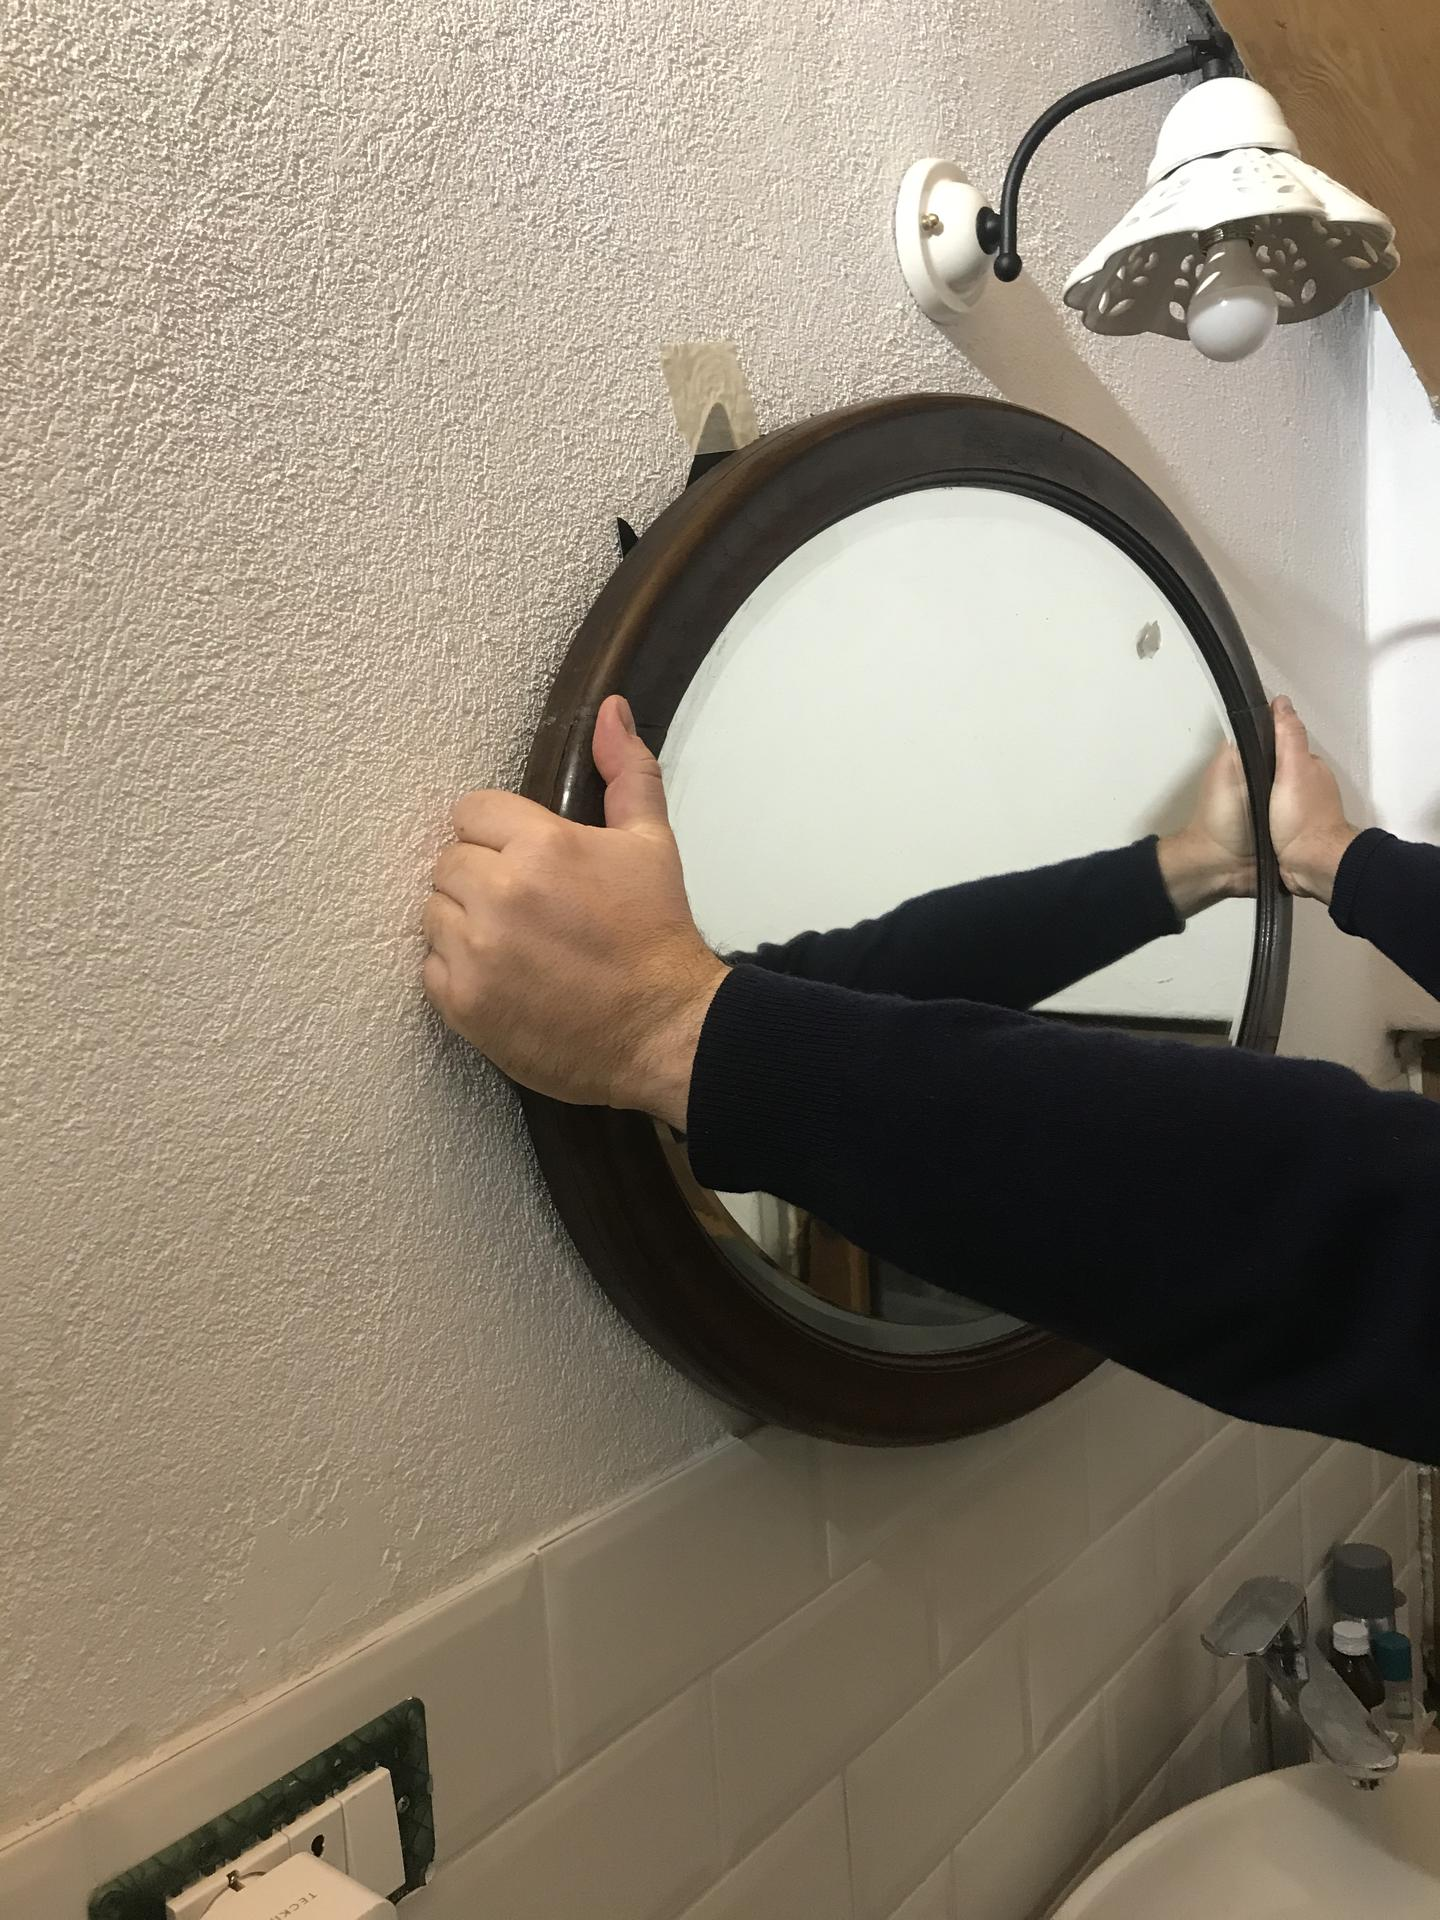 Horsky domcurik - Skuska 100 rocneho zrkalda- nepresvedcilo nas a vratilo sa do antikvariatu